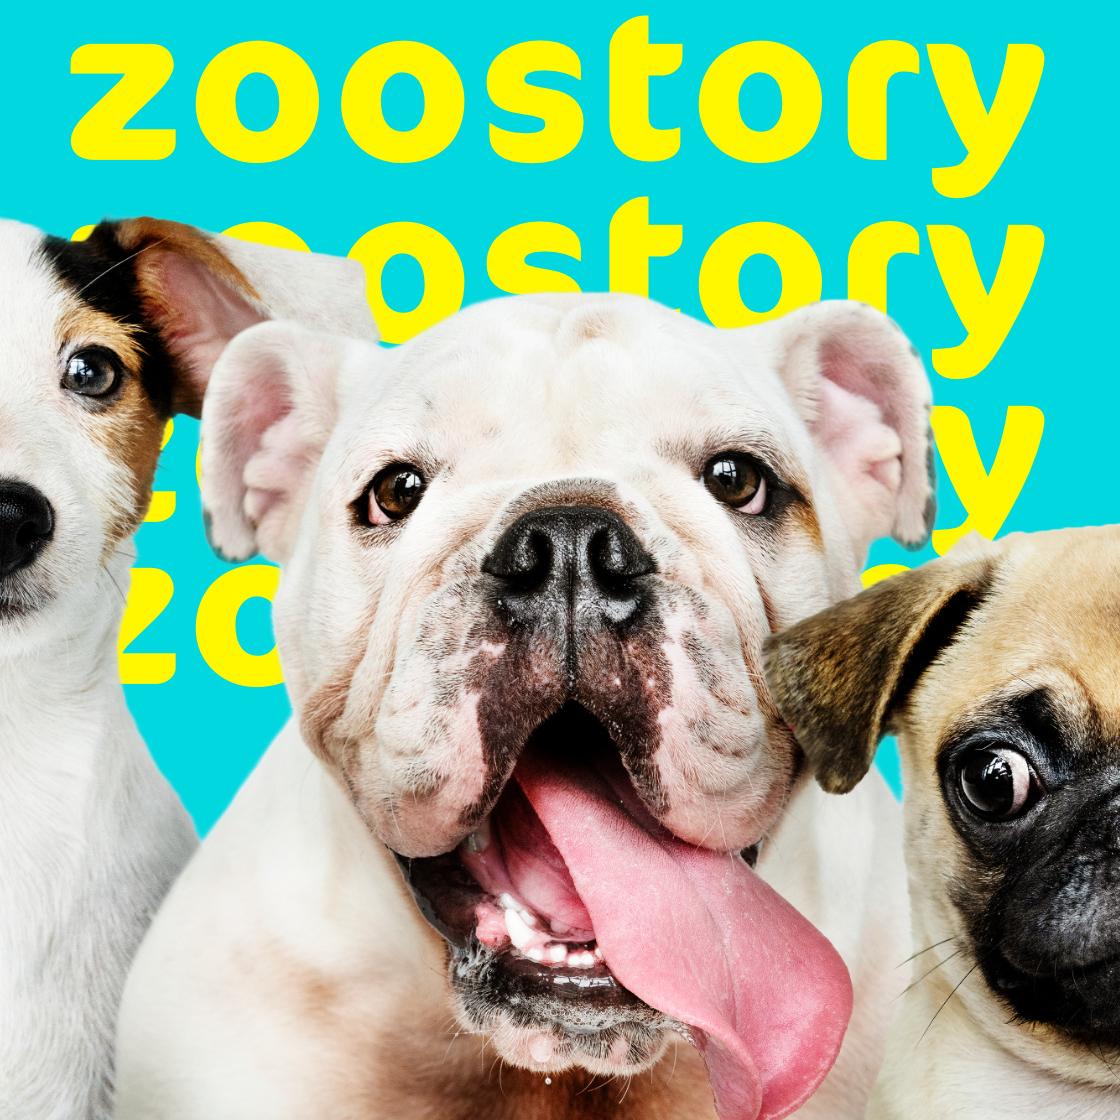 Branding zoostory